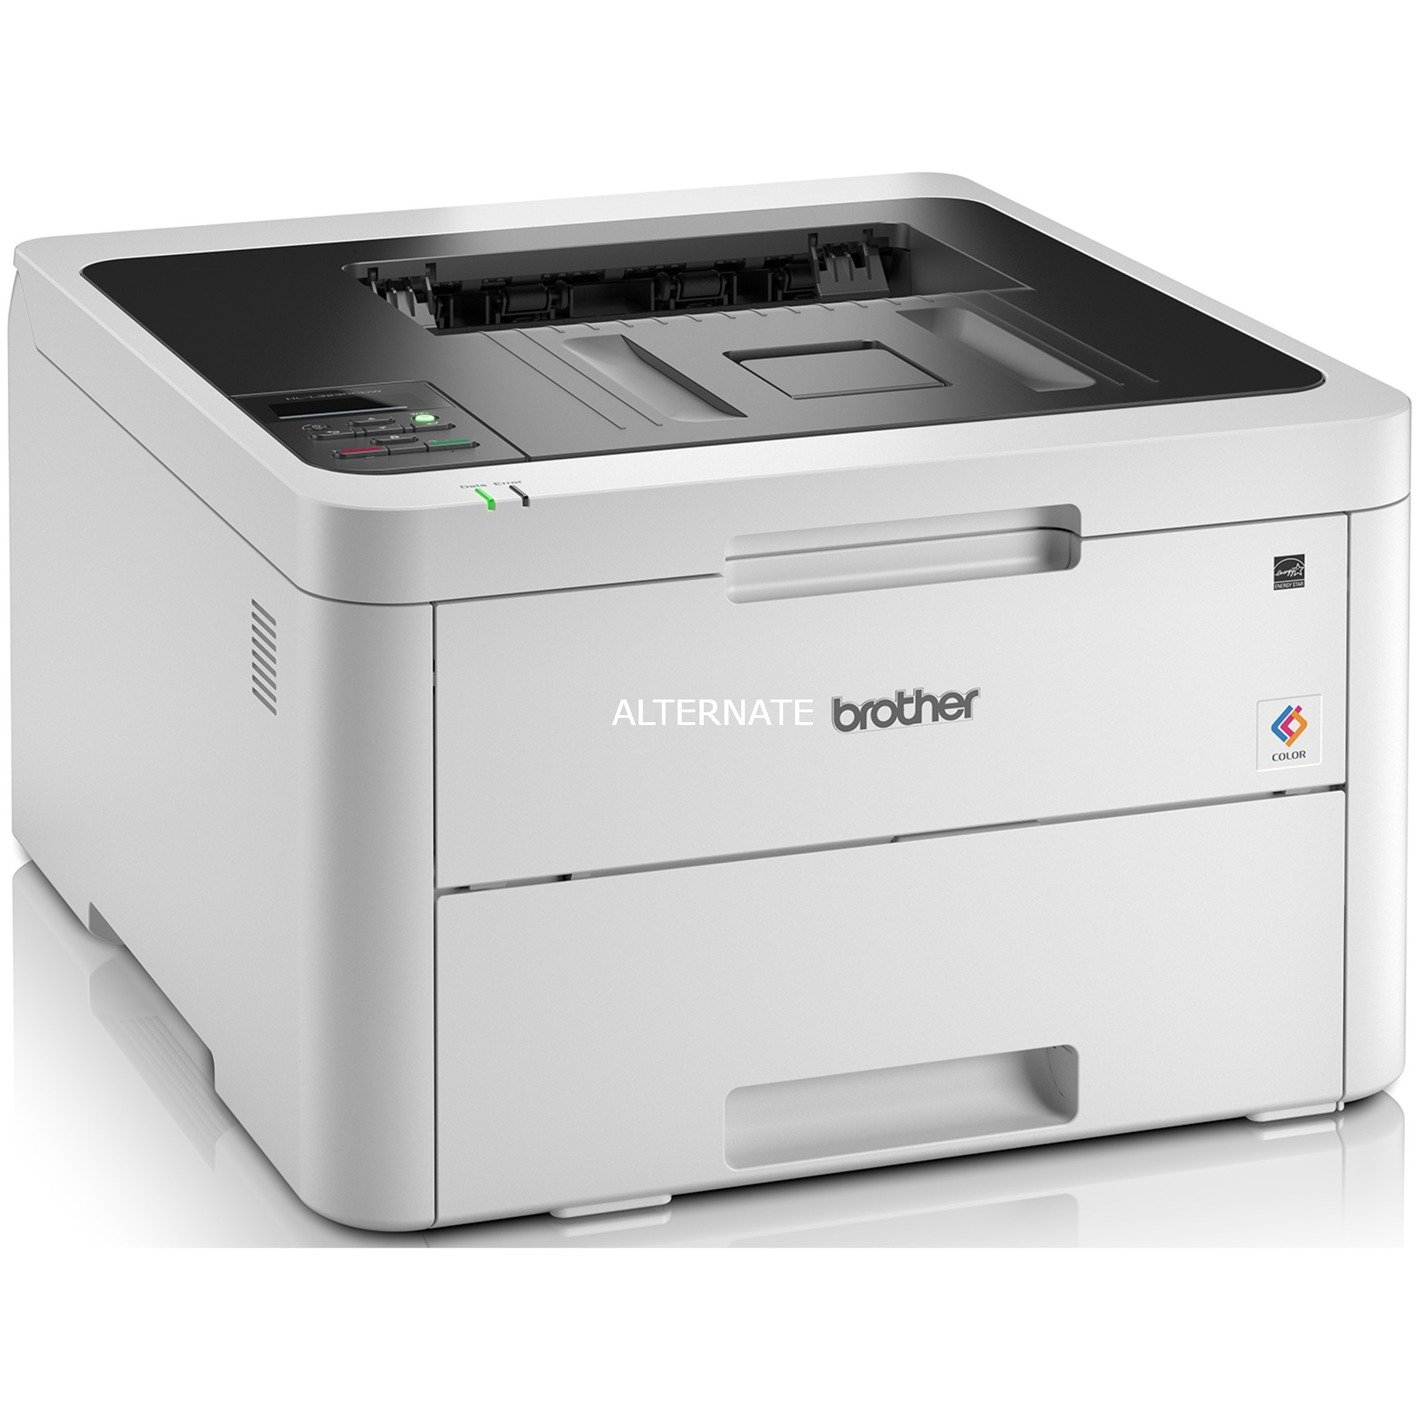 HL-L3230CDW impresora láser Color 2400 x 600 DPI A4 Wifi, Impresora LED